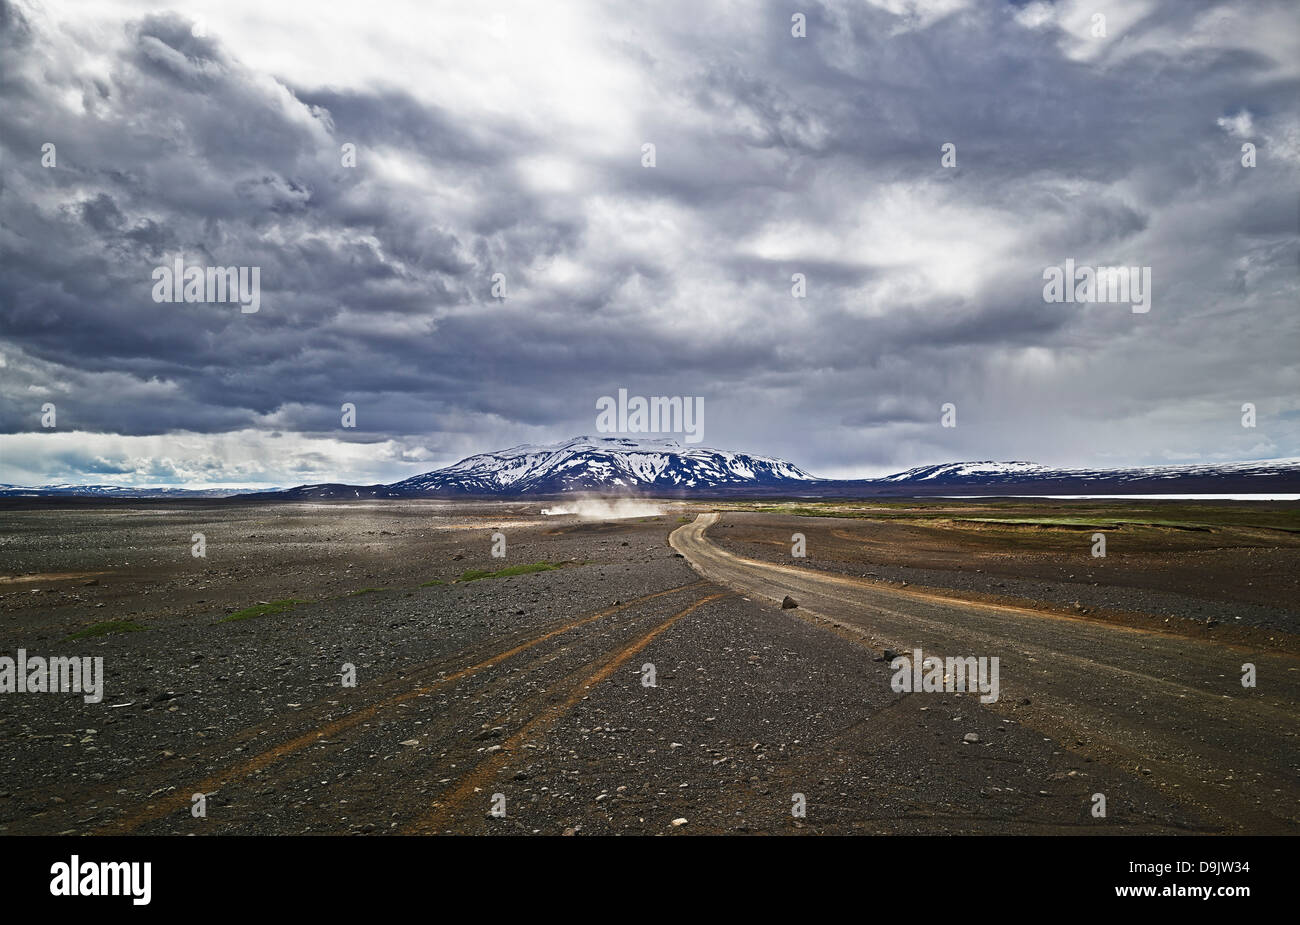 Dirt track in barren landscape, Road 35, Kerlingarfjoll, Iceland - Stock Image